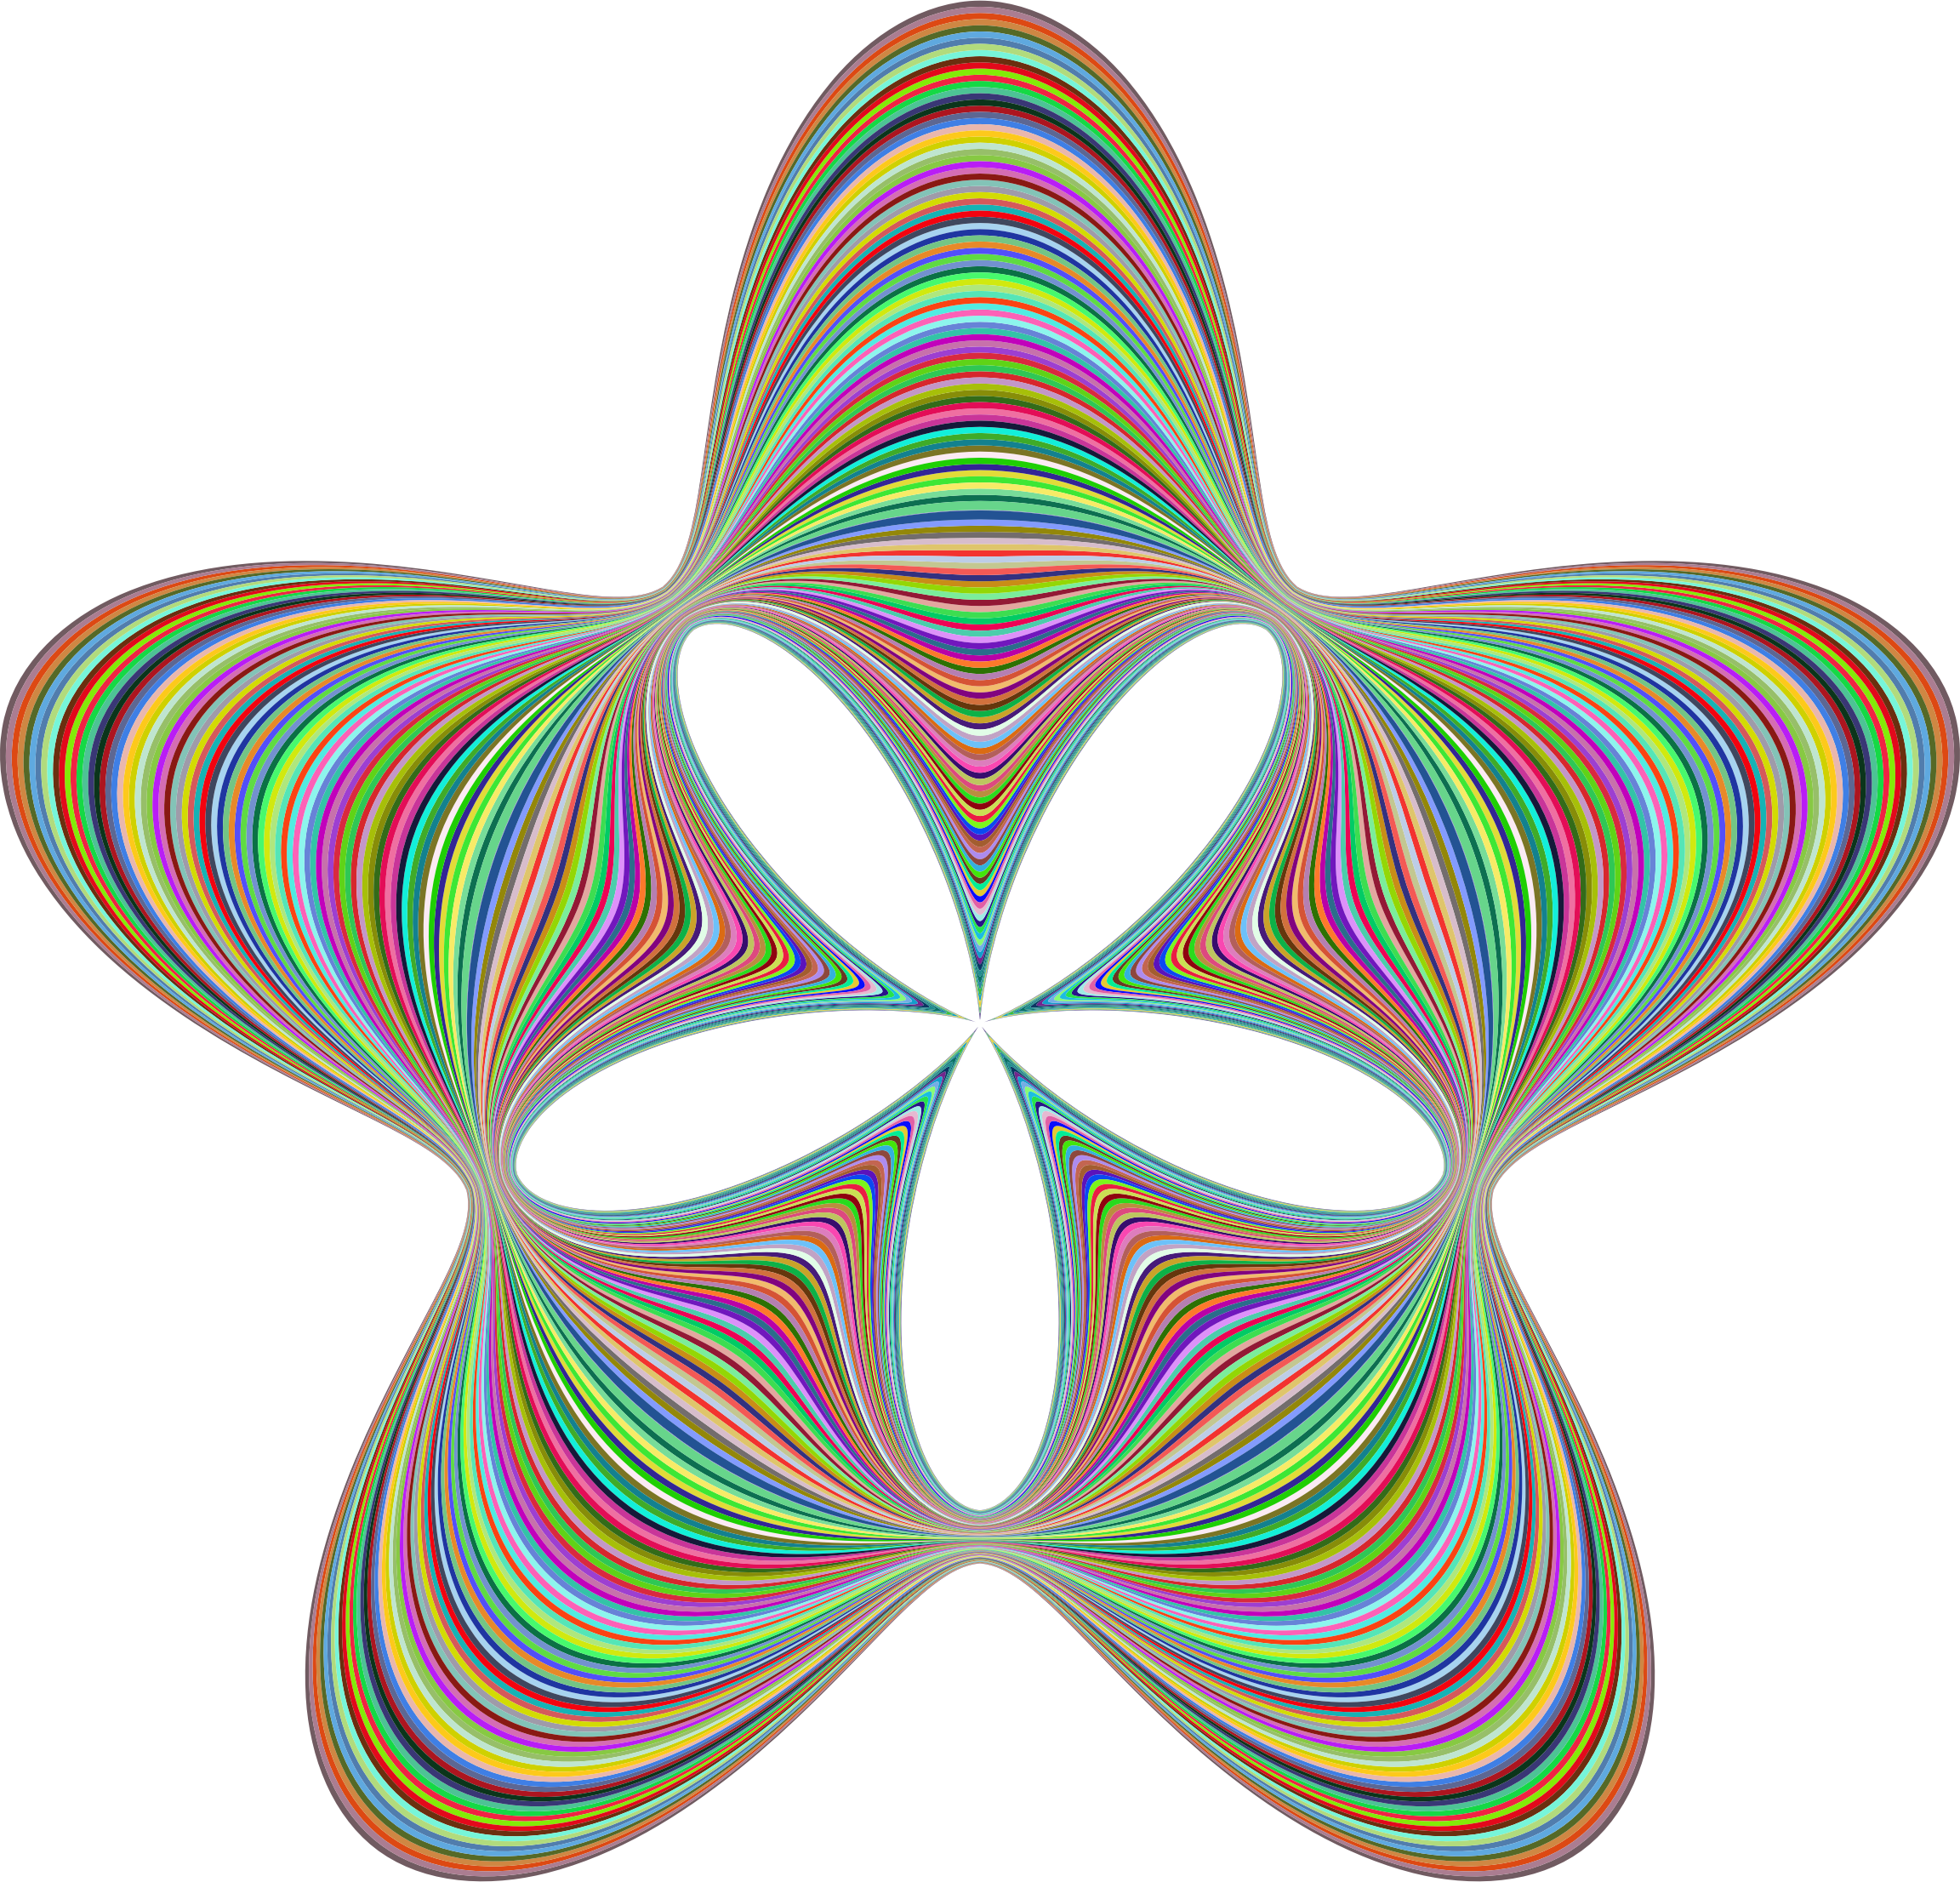 Prismatic big image png. Clipart waves star